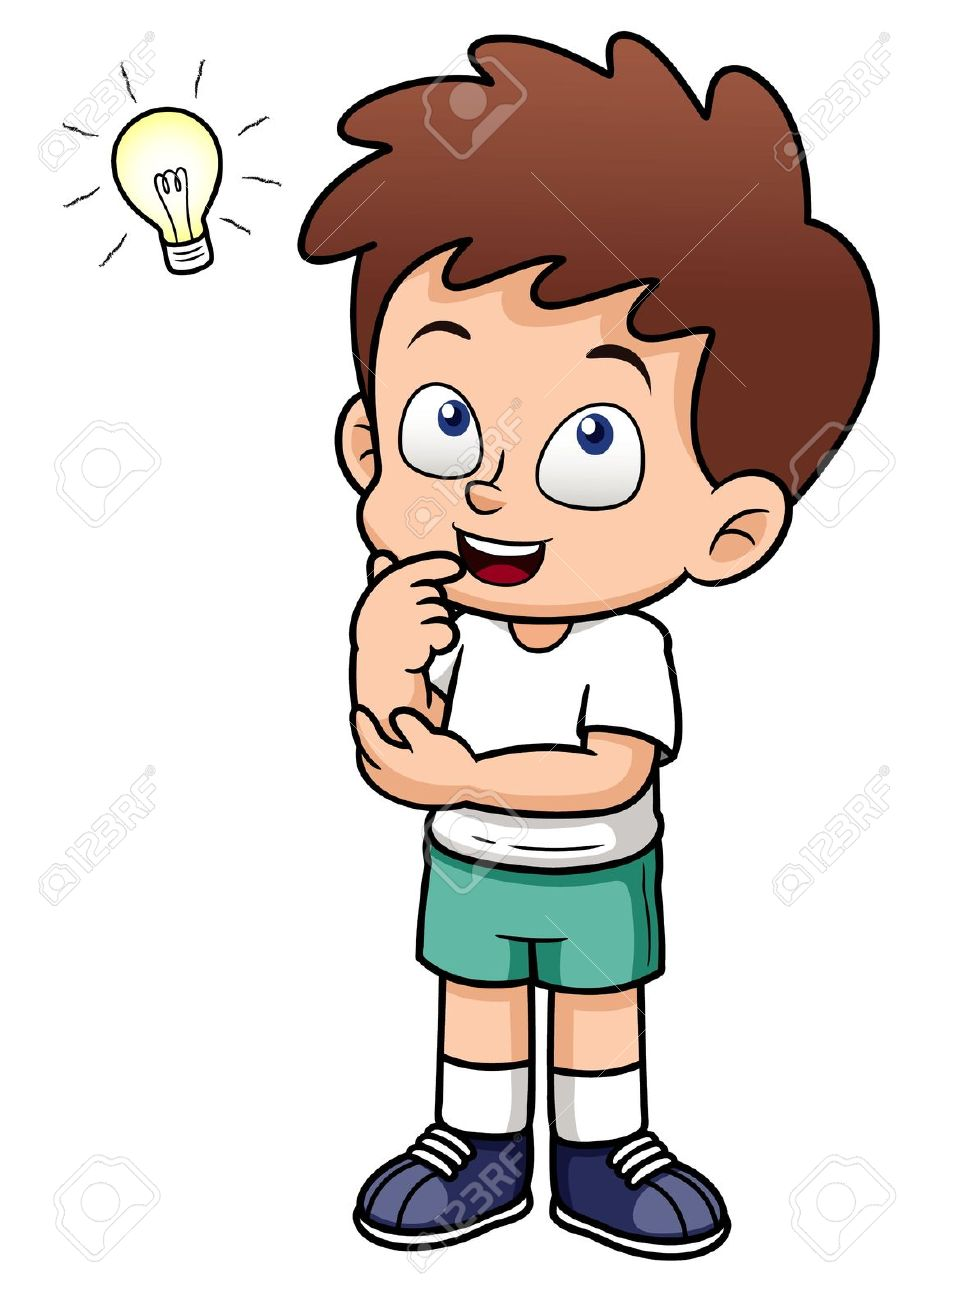 Think clipart images clip transparent download Best Child Thinking Clipart #14285 - Clipartion.com clip transparent download